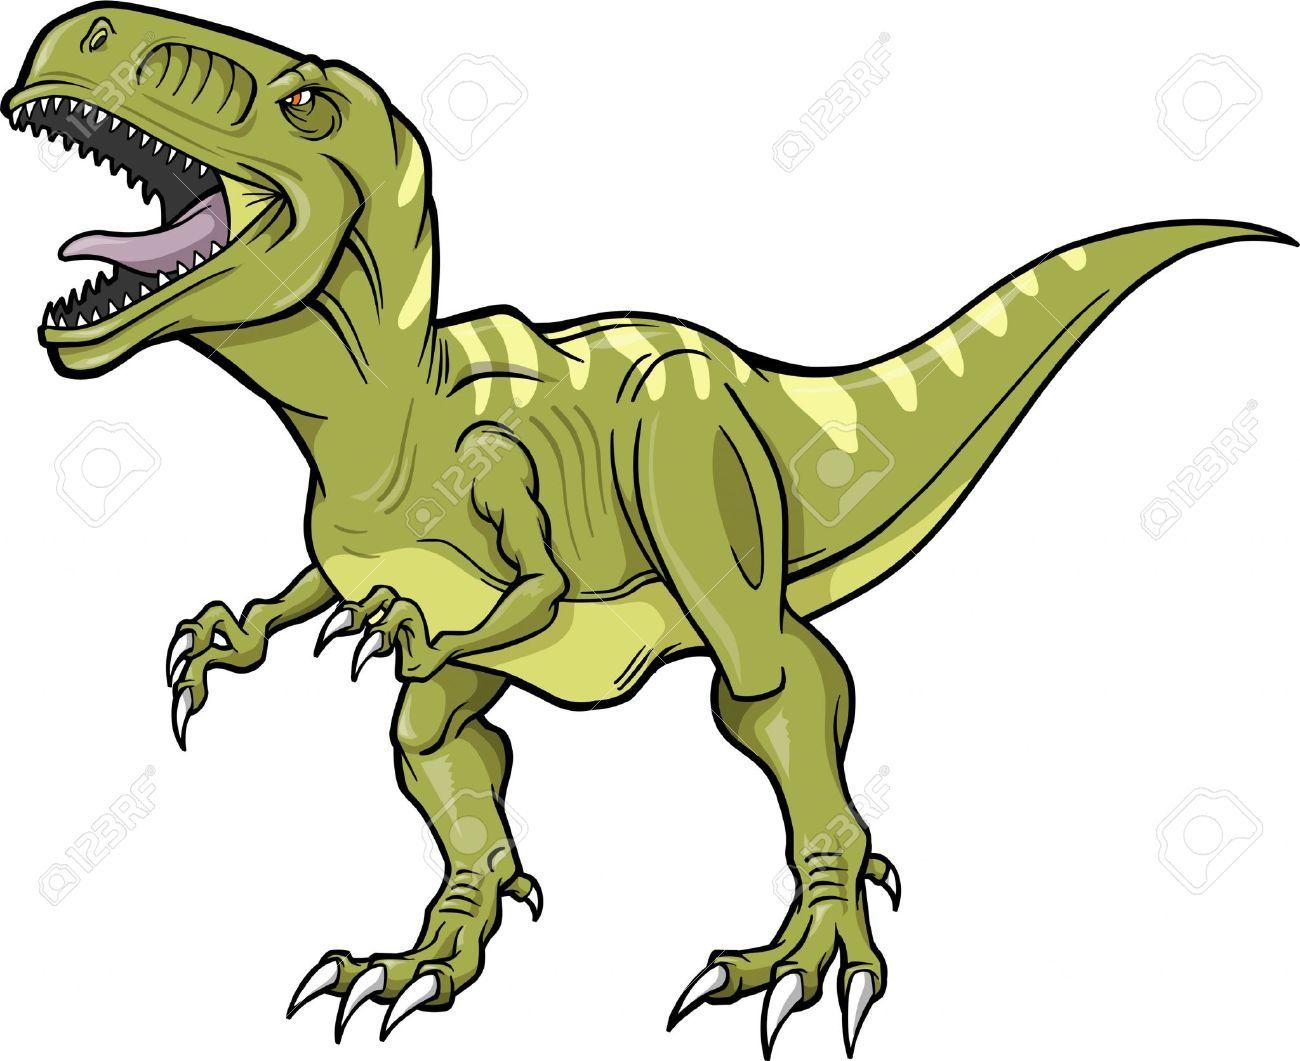 T-rex Dinosaur Vector Illustration Royalty Free Cliparts, Vectors ...